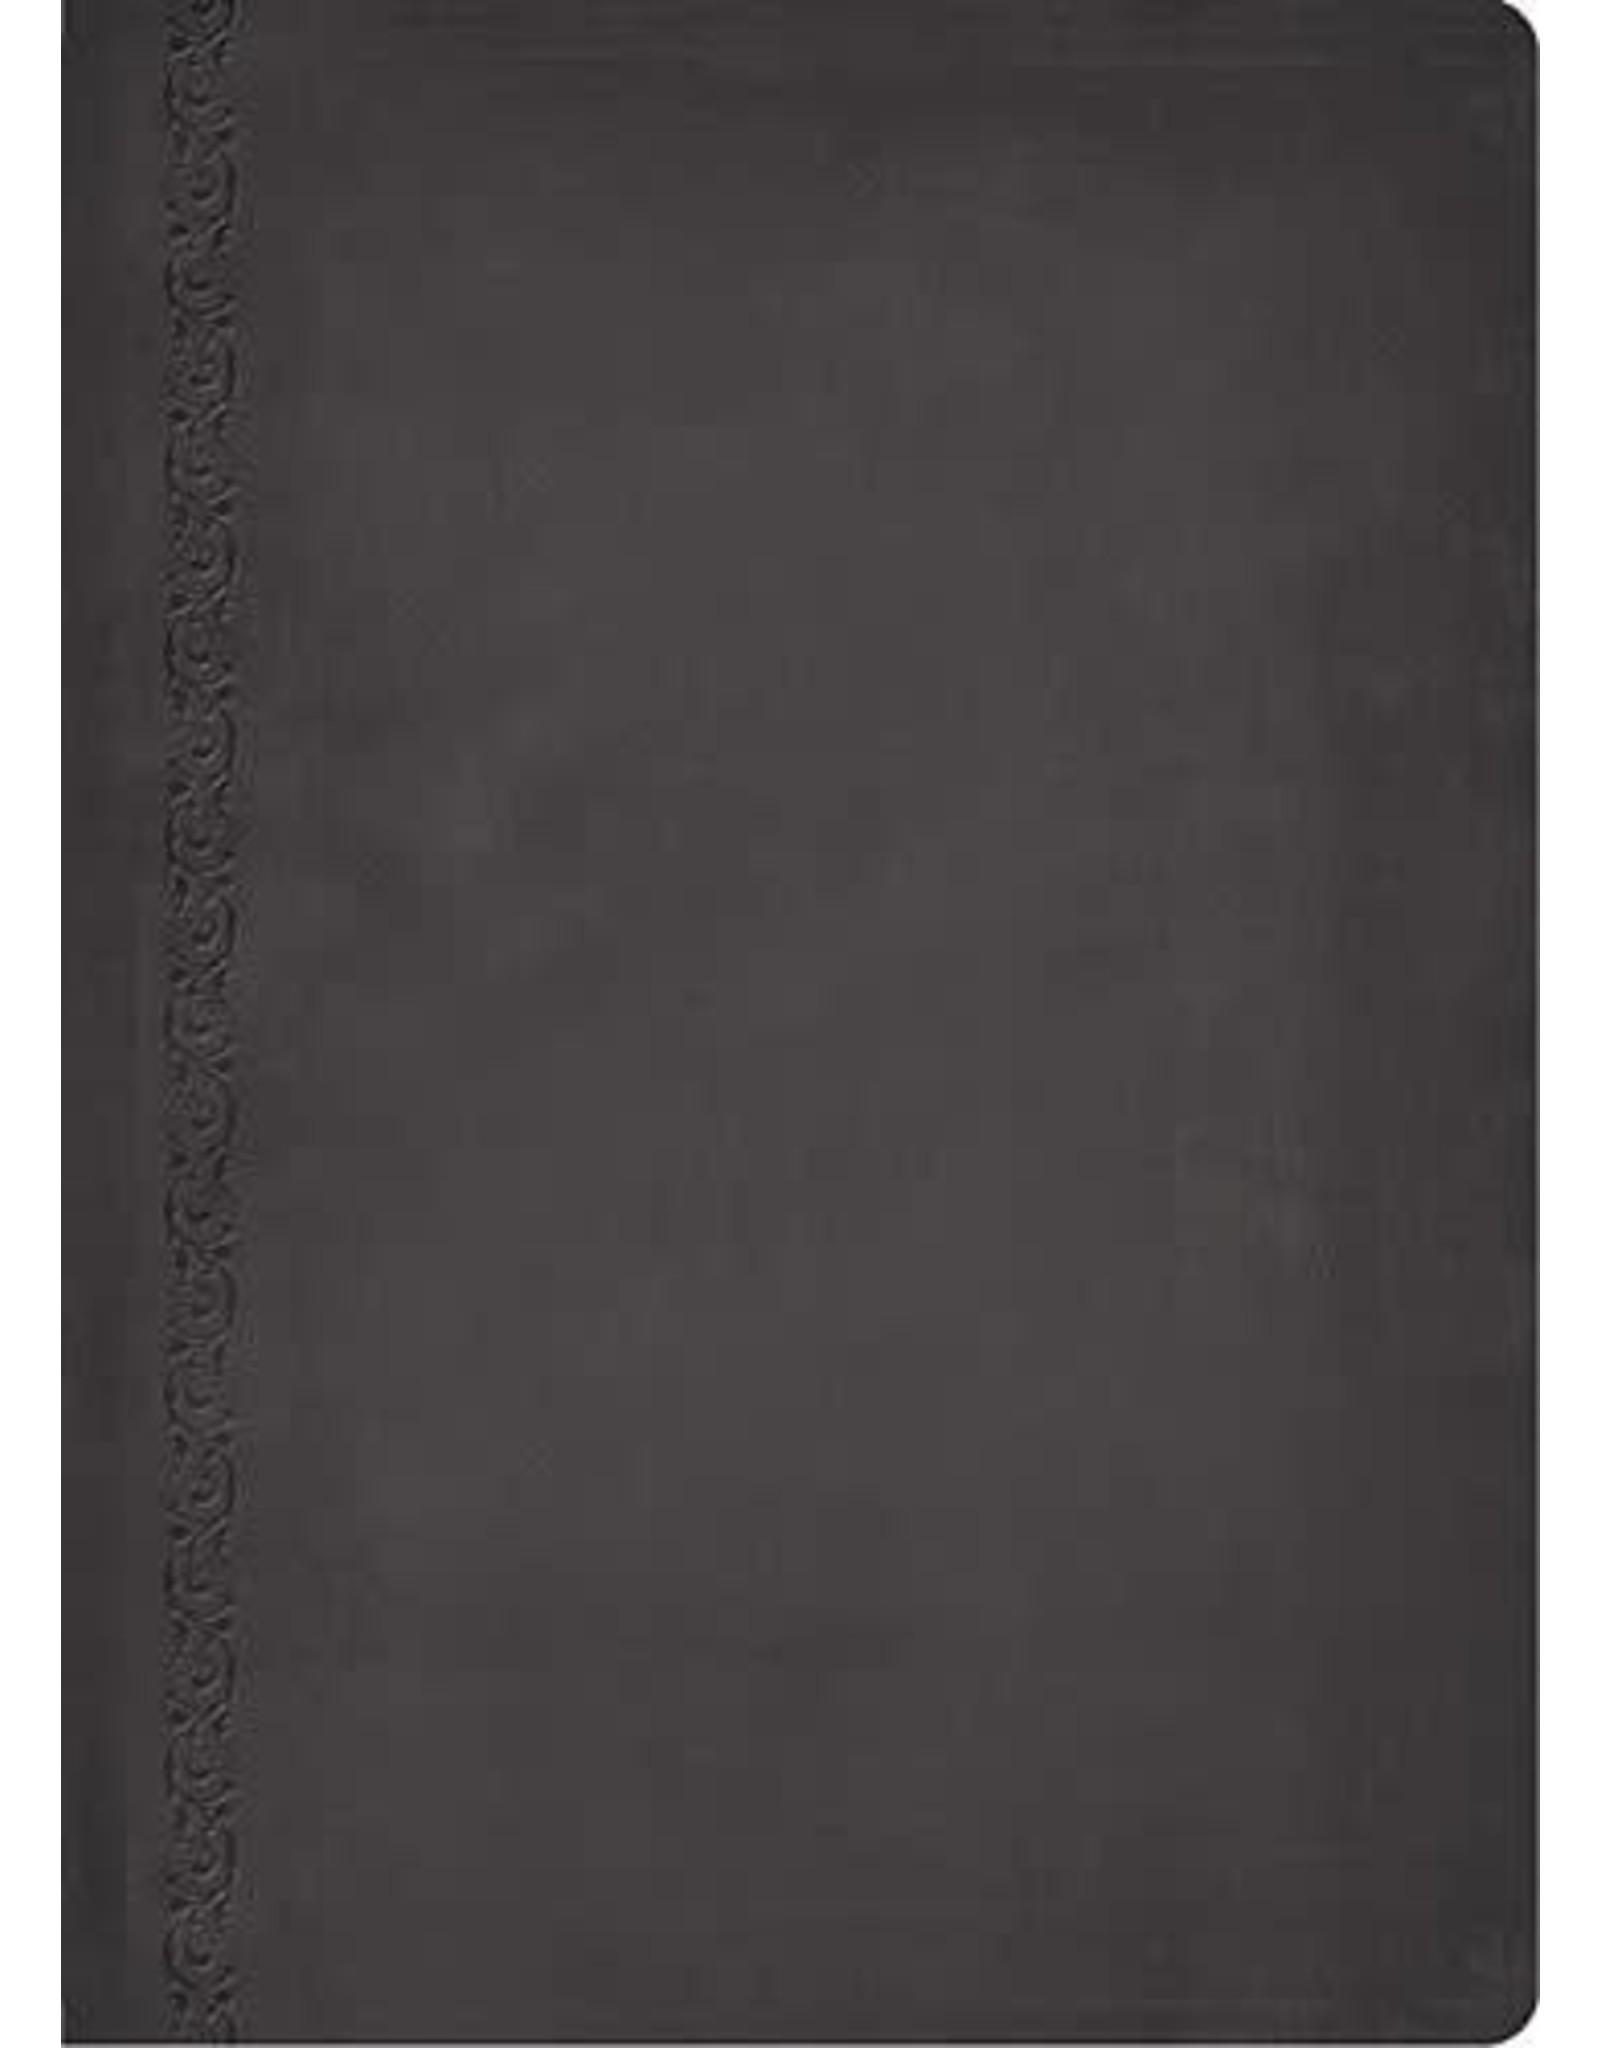 Harper Collins / Thomas Nelson / Zondervan MacArthur Study Bible NKJV Leathersoft Raven Discounted